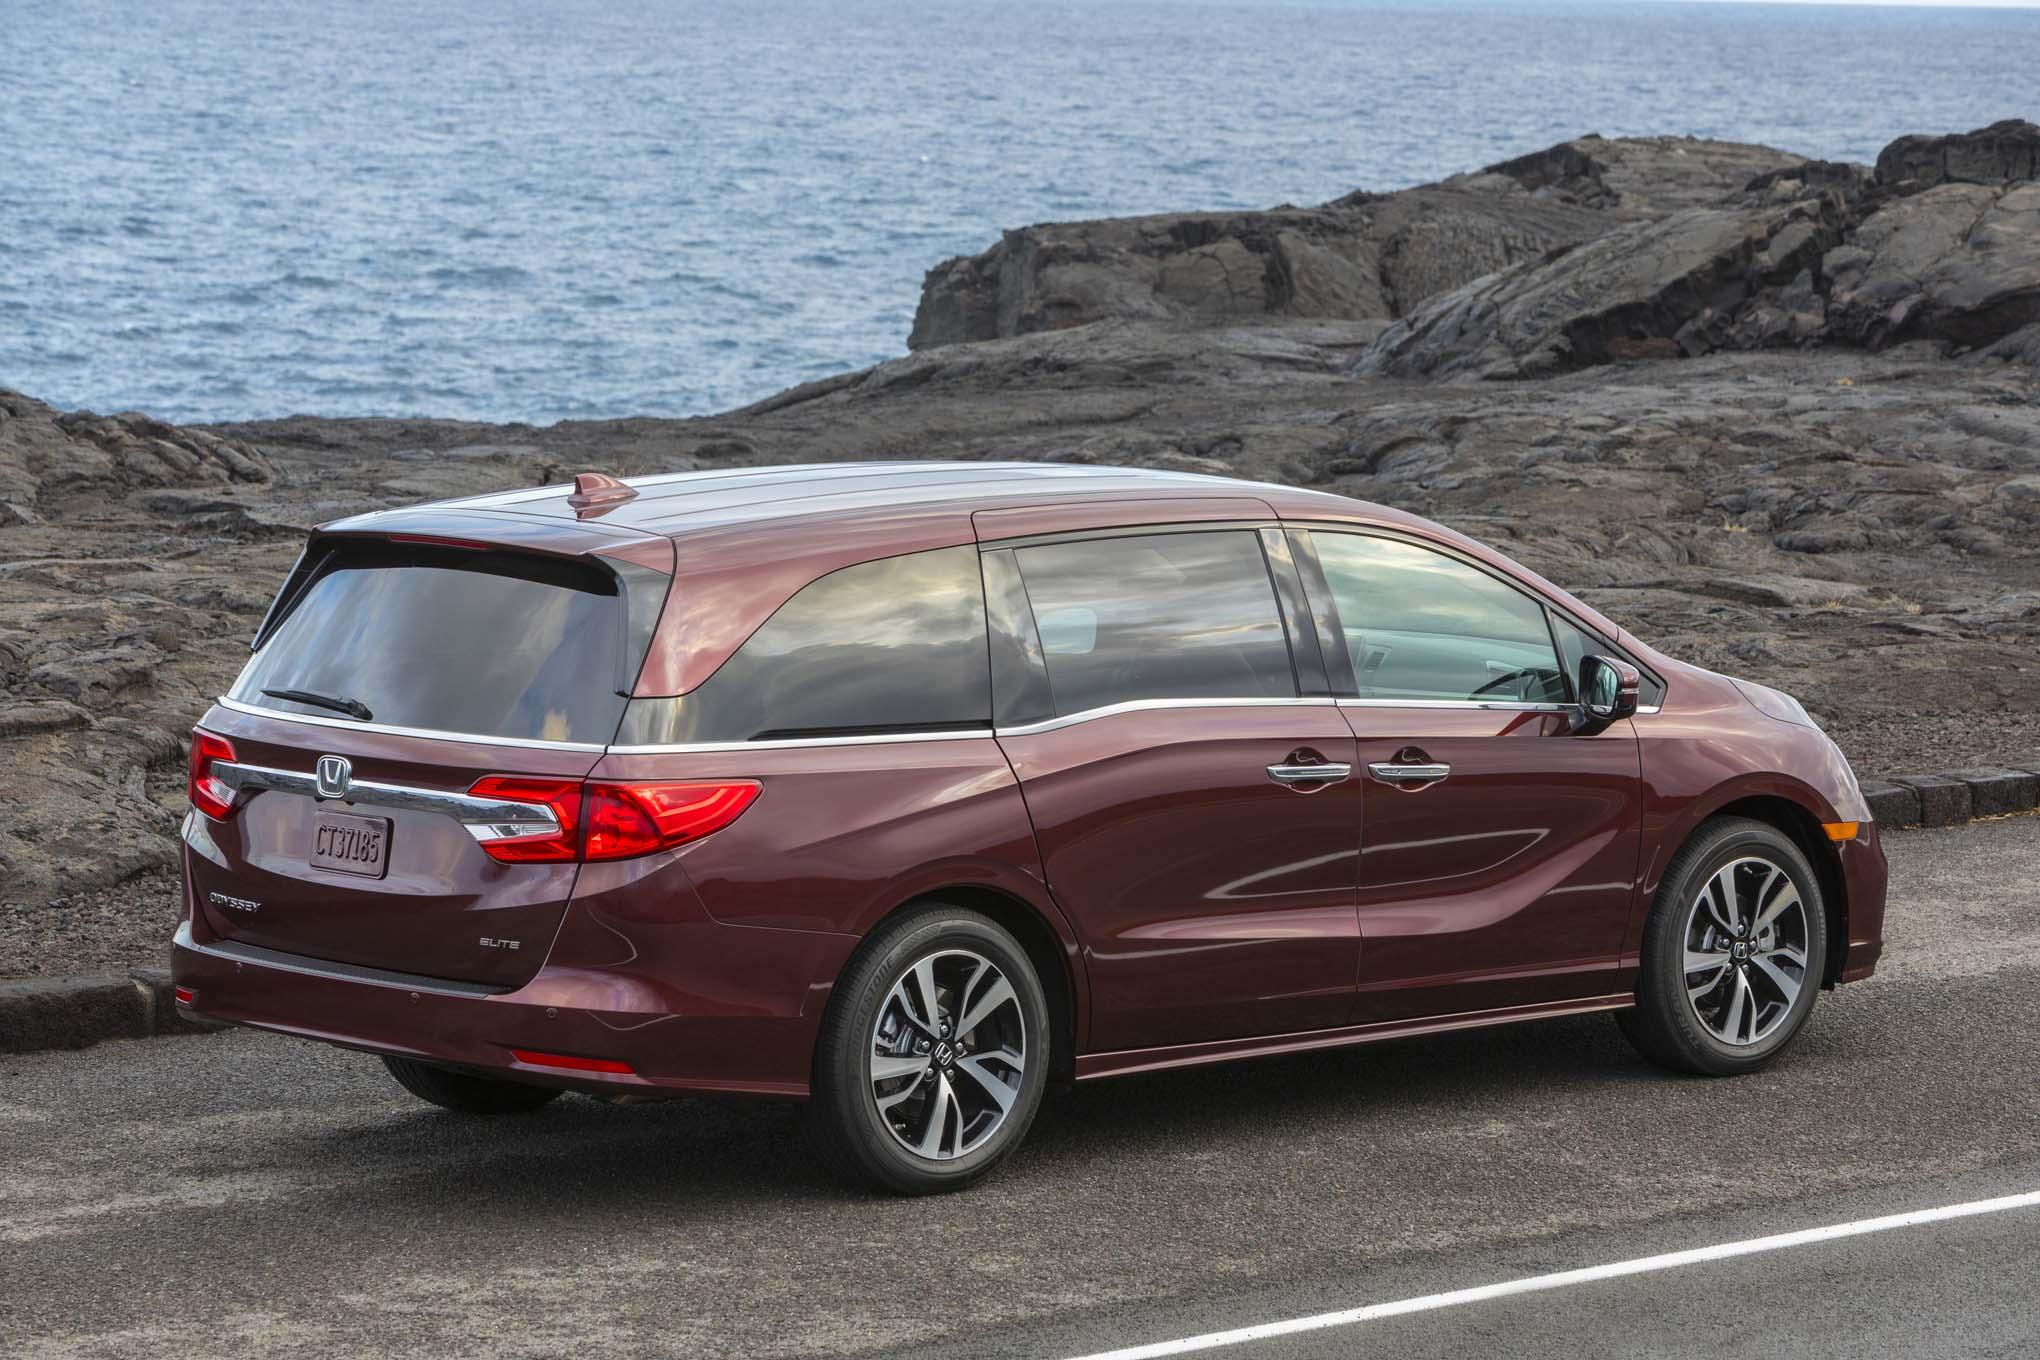 2018 Honda Odyssey Rear Three Quarter 04